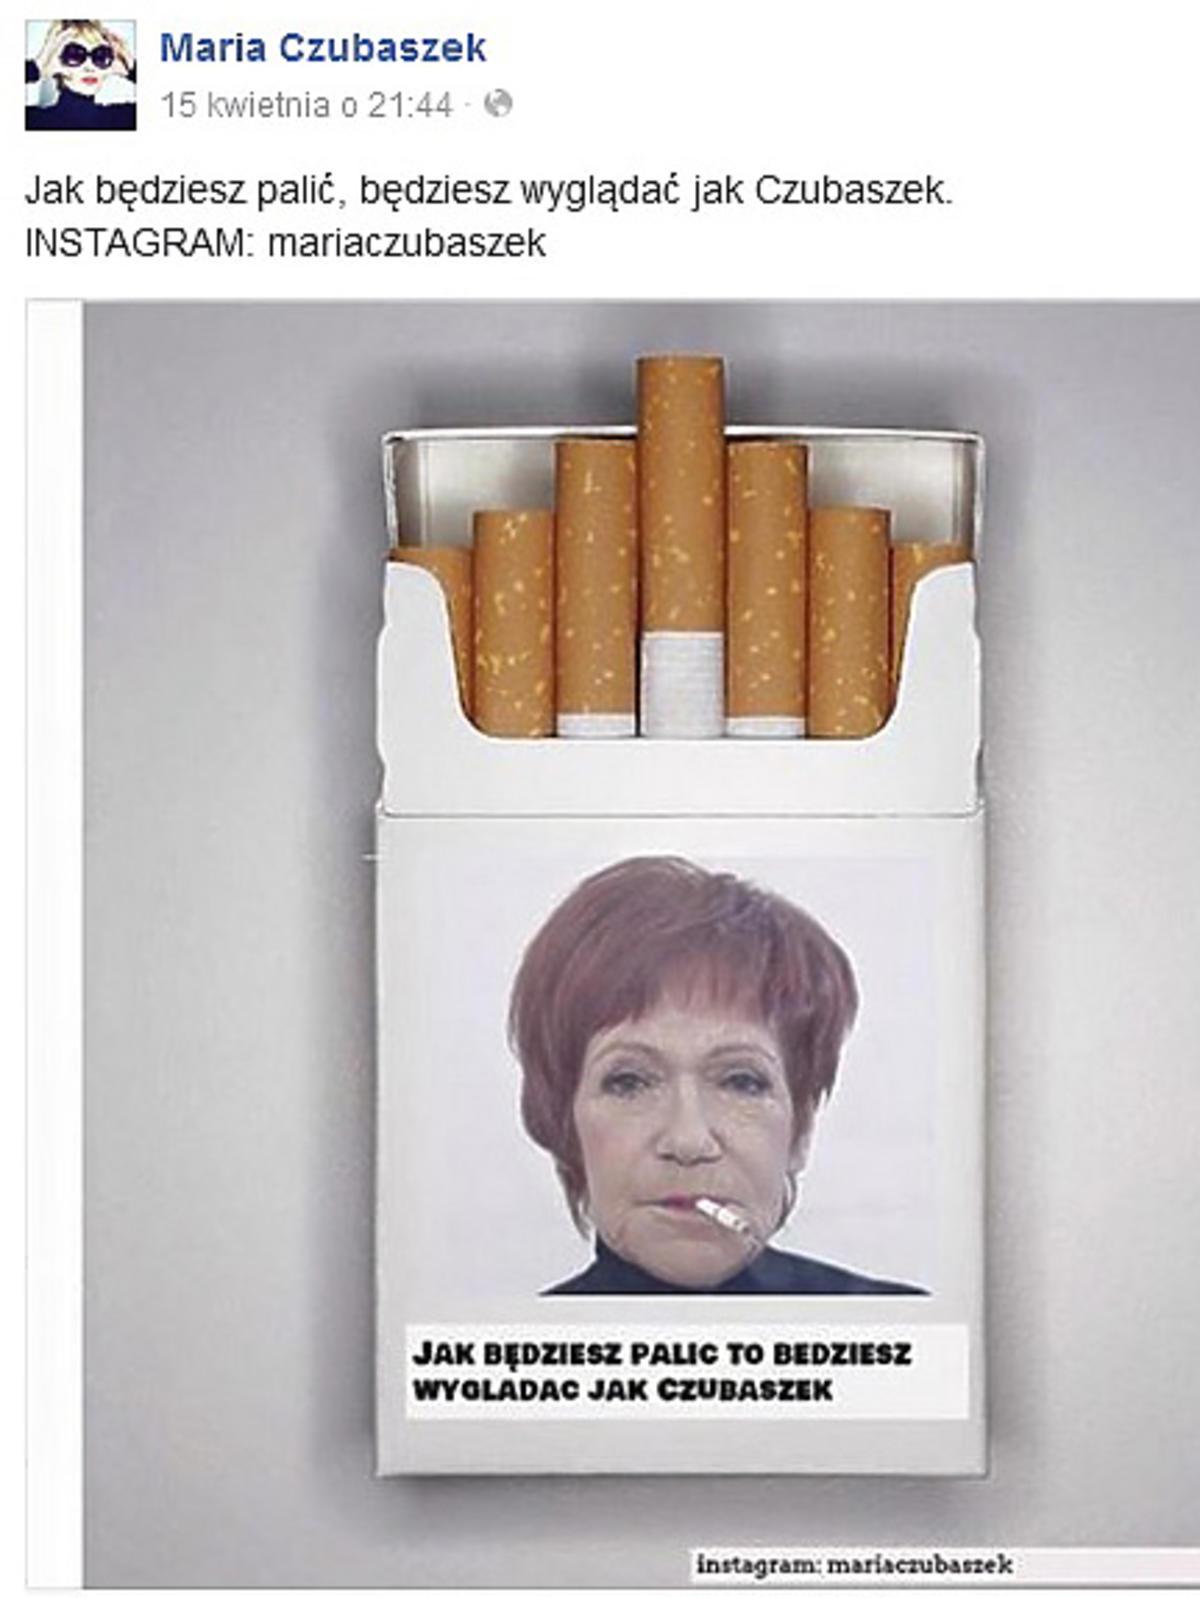 Żarty Marii Czubaszek na Facebooku